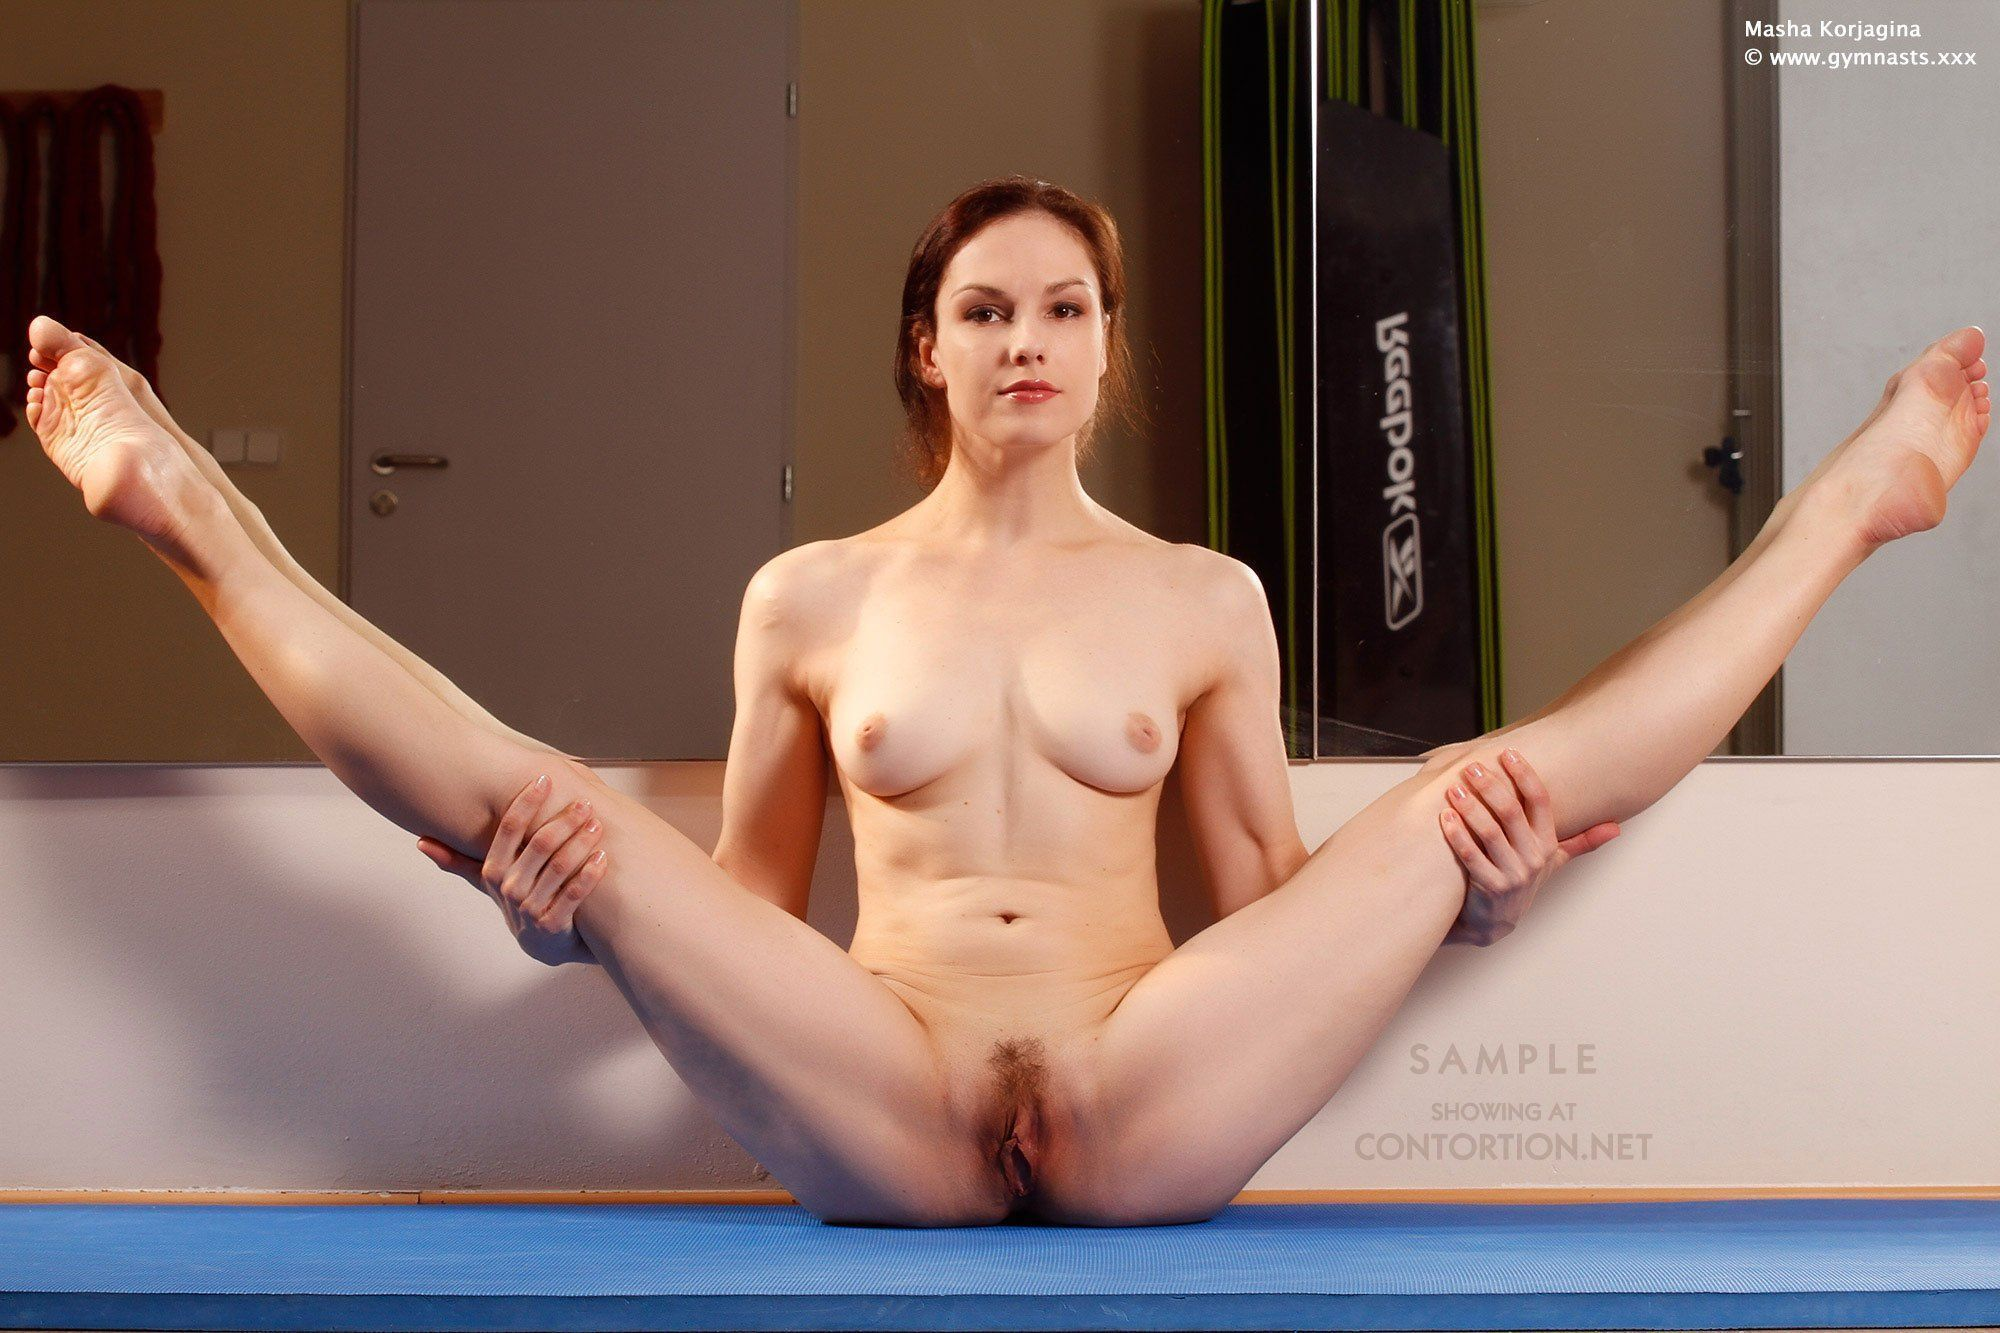 Naked wife doing yoga